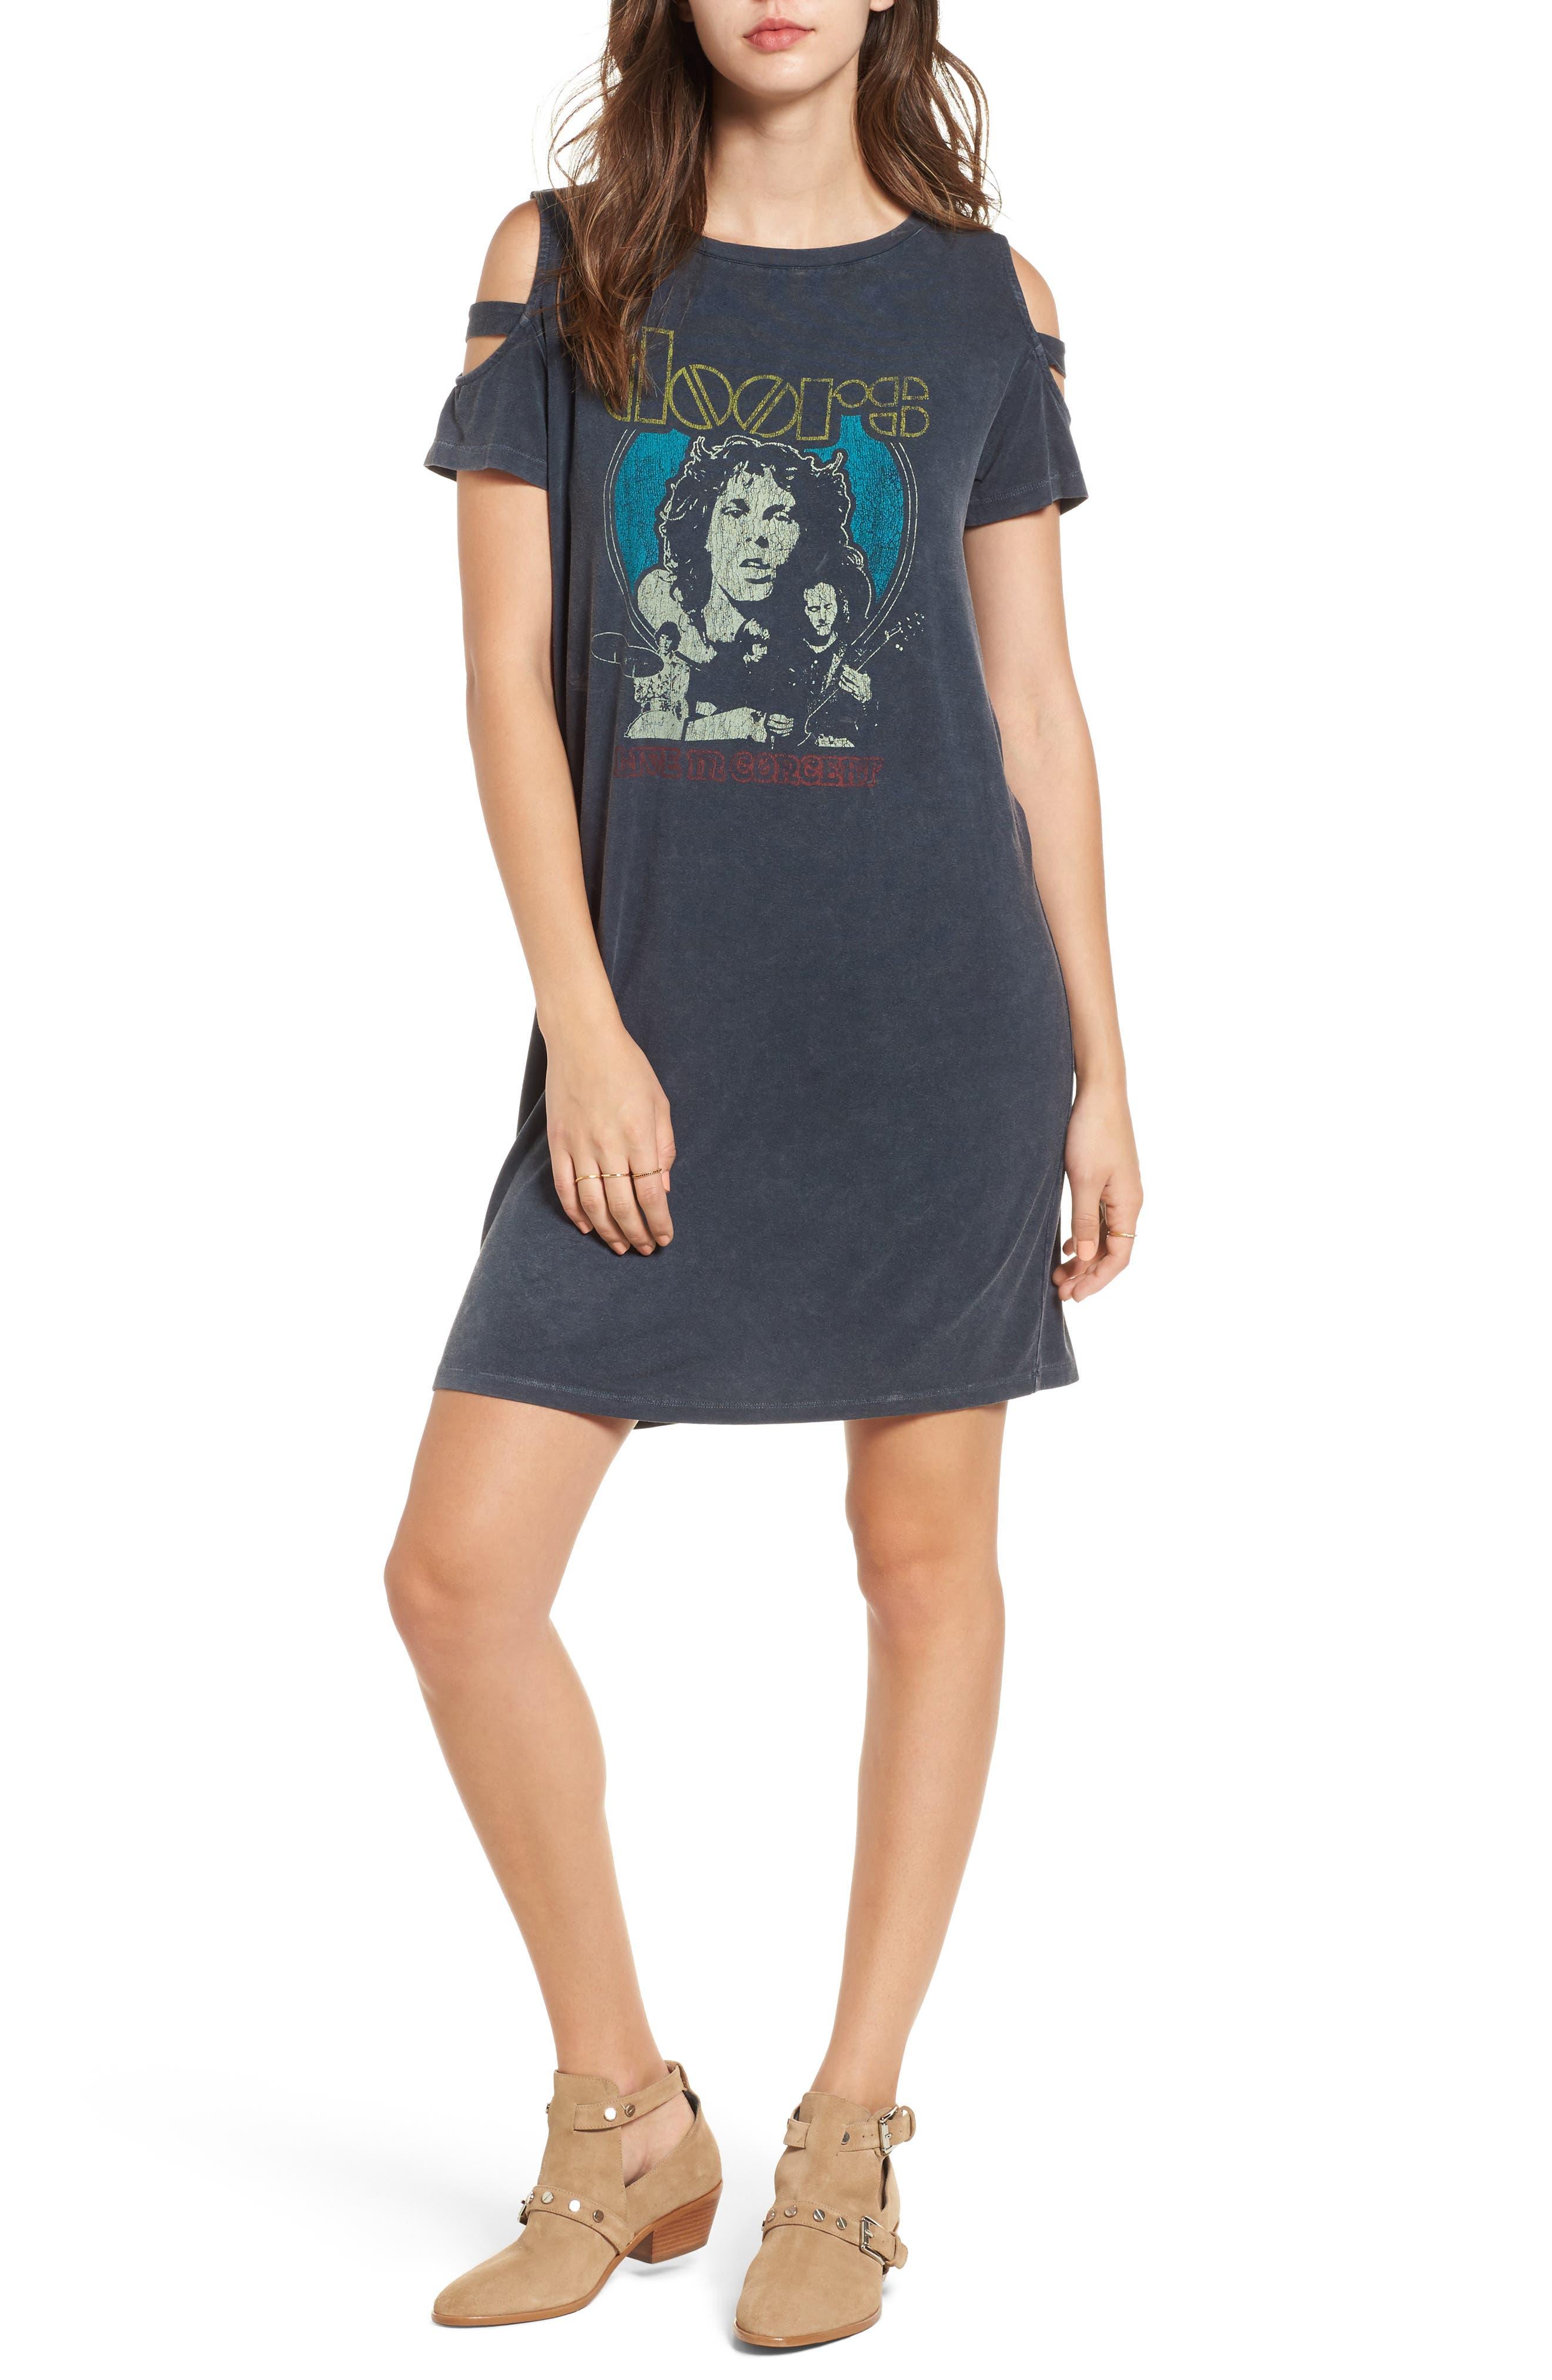 Main Image - Mimi Chica Doors Distressed Band T-Shirt Dress